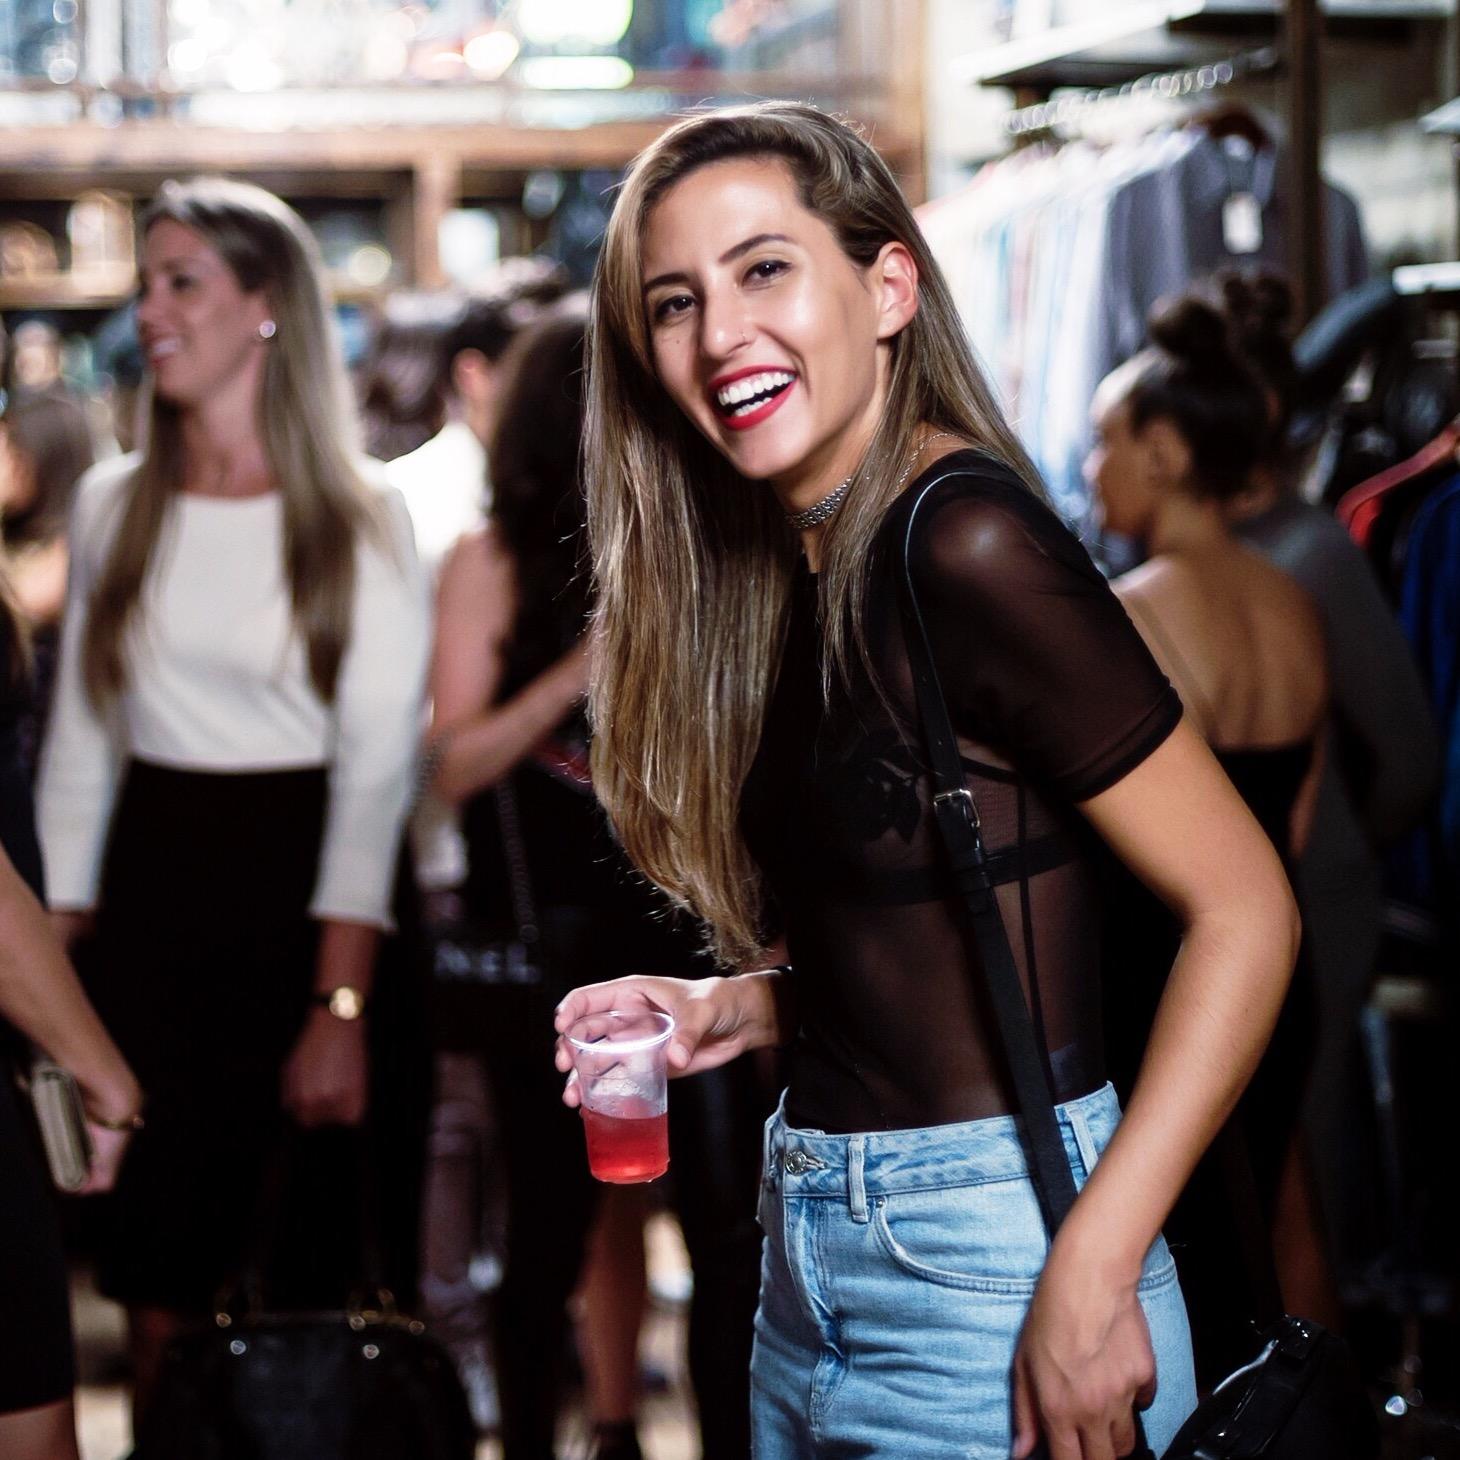 raquel_paiva_fashion_blogger_mesh_bodysuit_wgaca_nyfw_kickoff_party